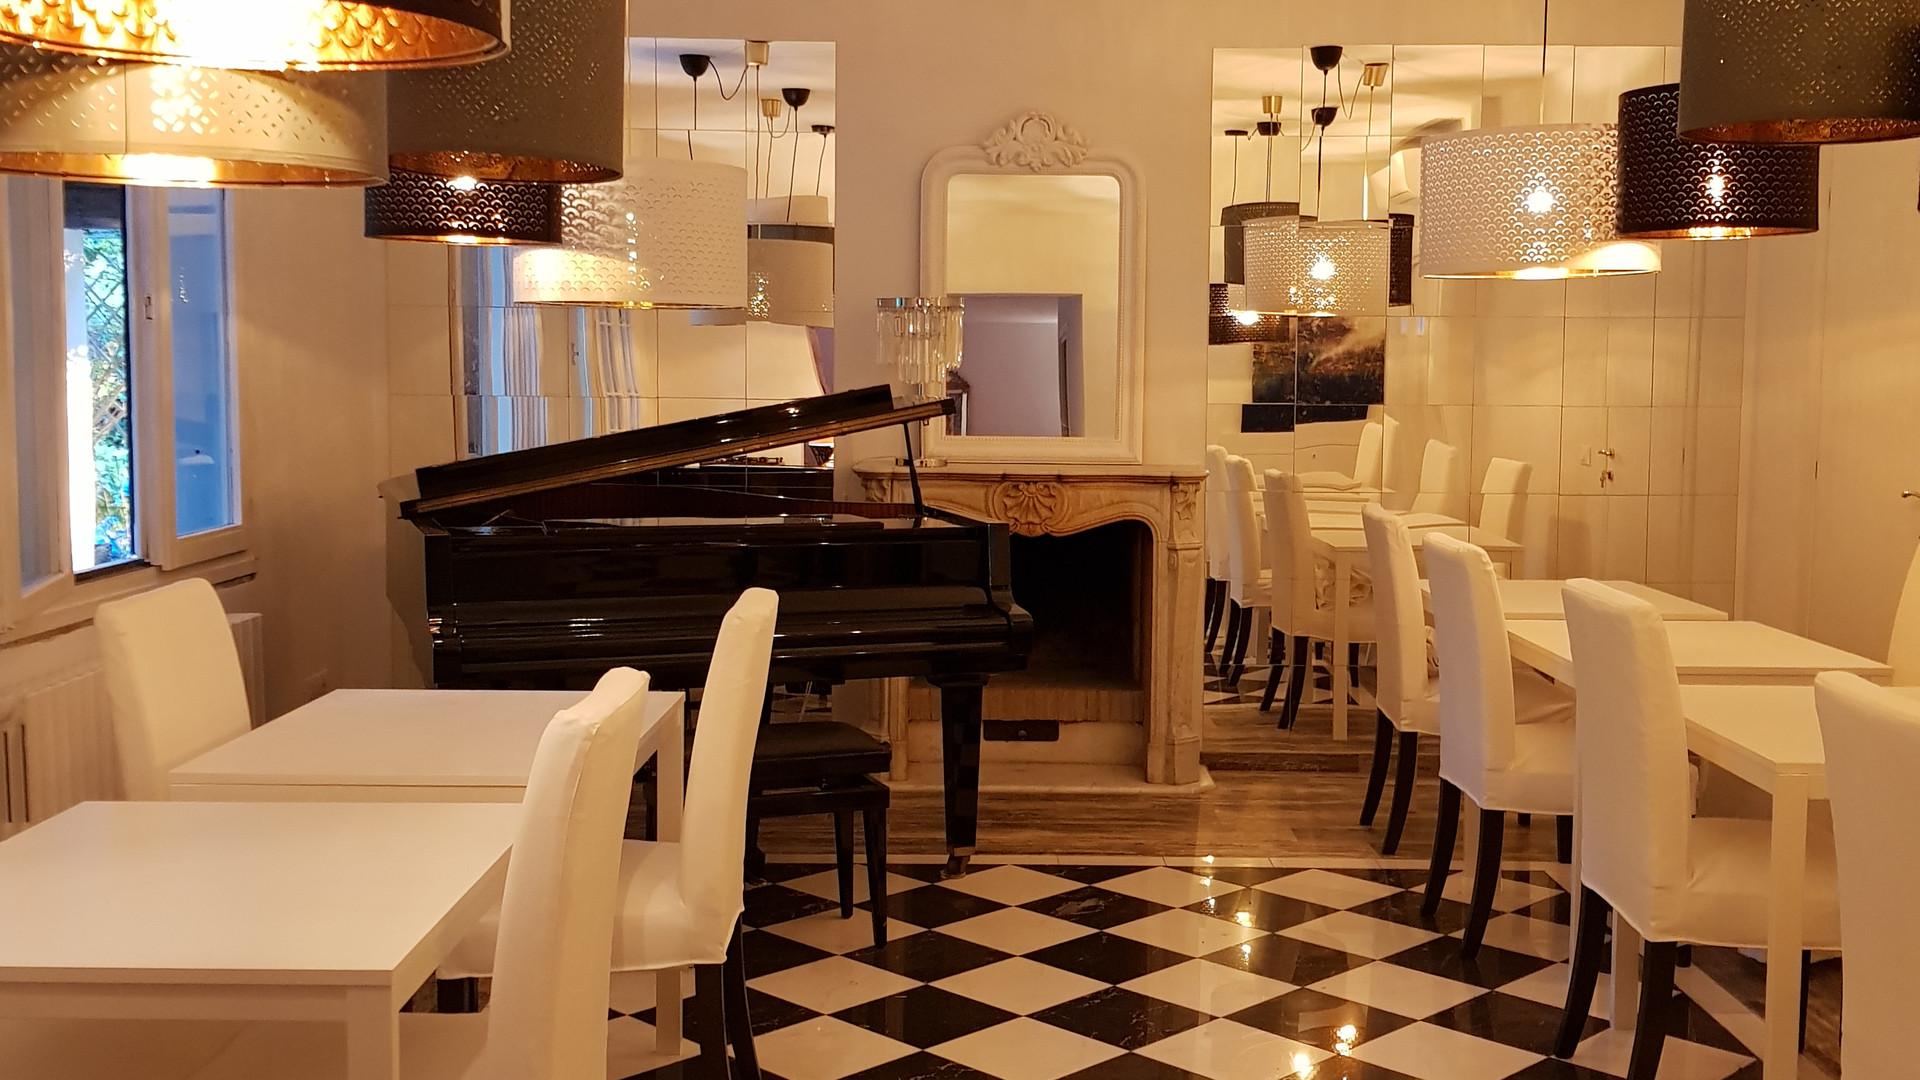 The Dining Room, inspired to XVIII century design